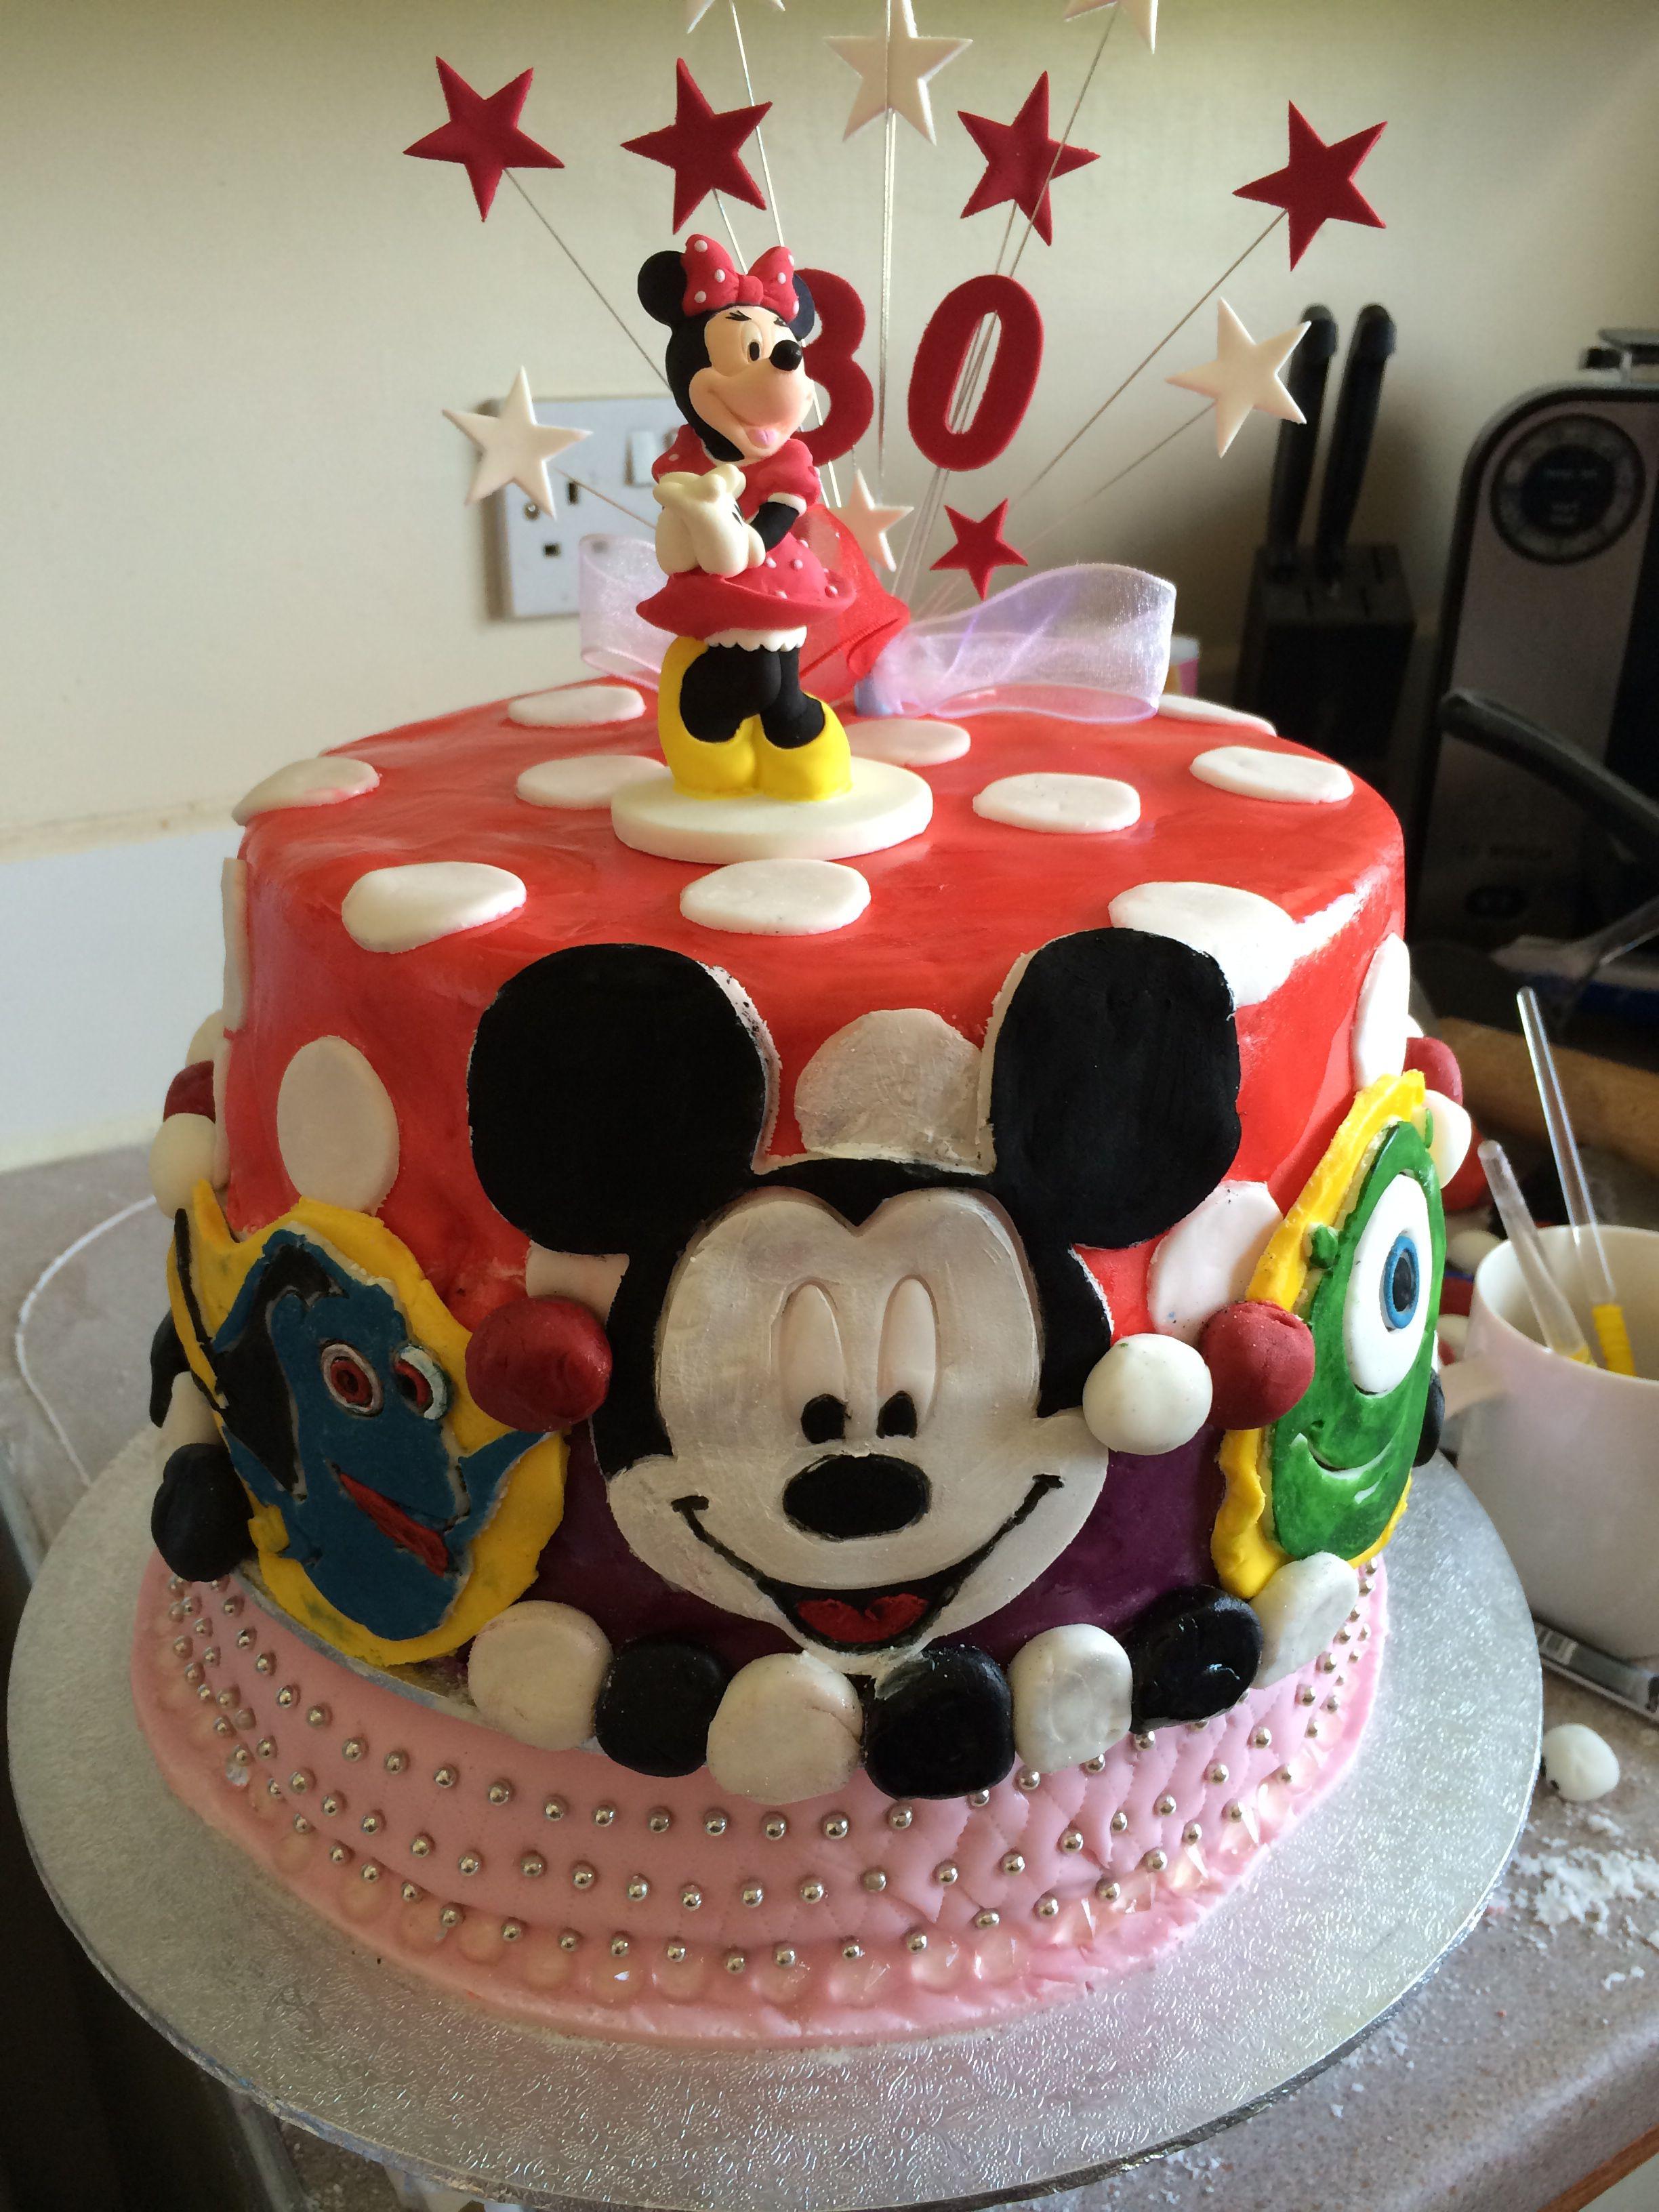 Superb Disney Themed 30Th Birthday Cake I Made With Images 30 Funny Birthday Cards Online Inifodamsfinfo